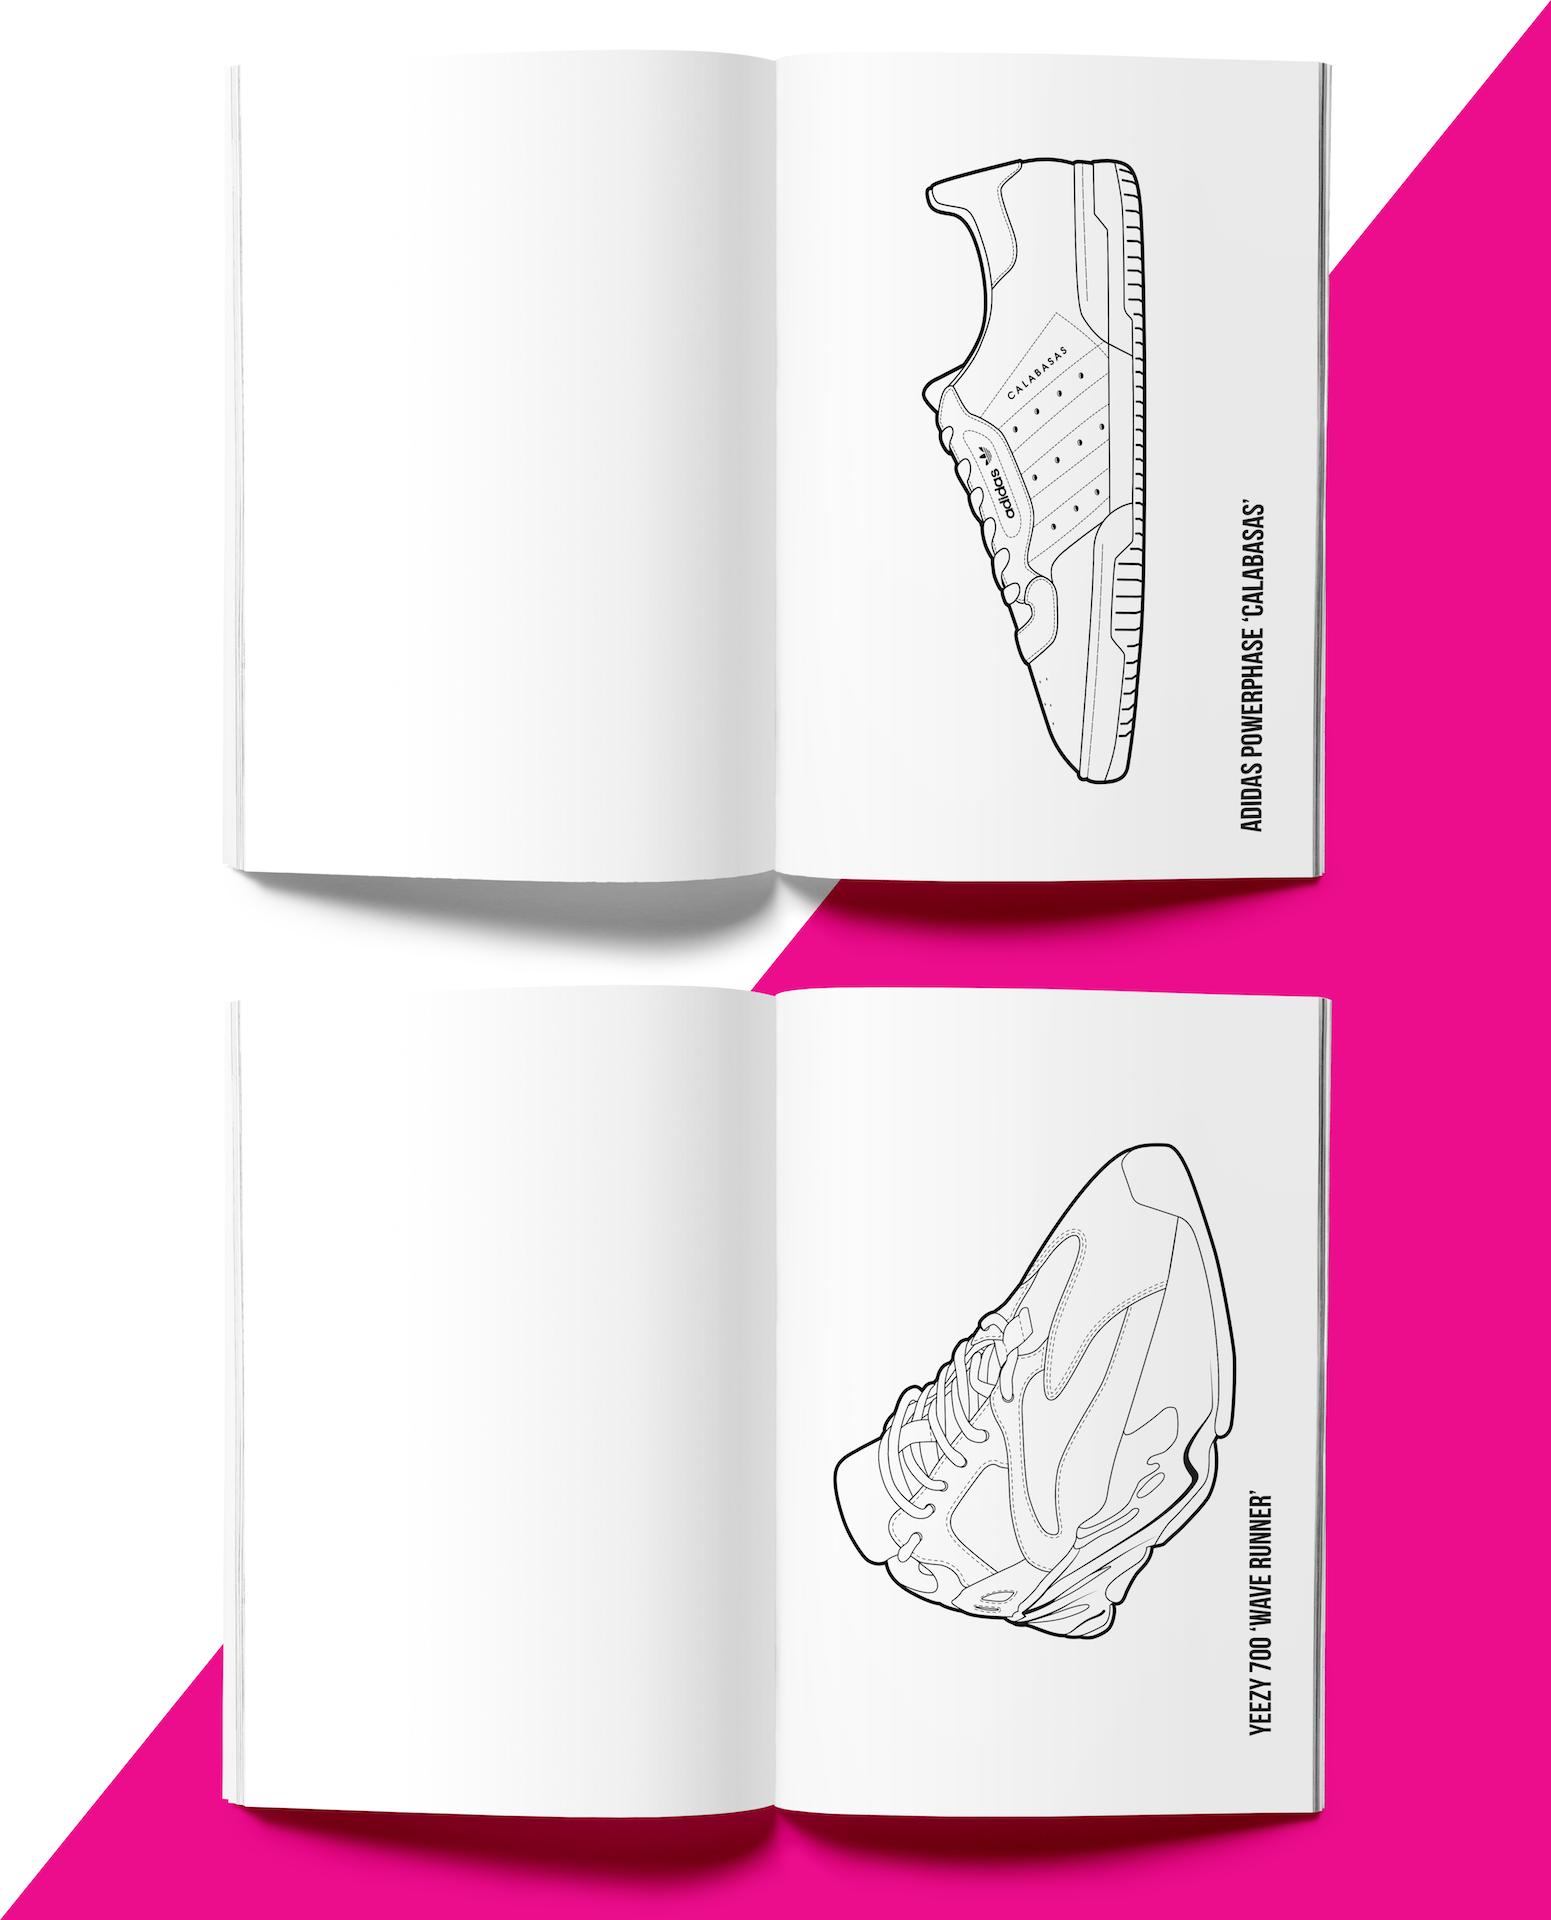 Hyprints | The Hyprints Premium Sneaker Coloring Book